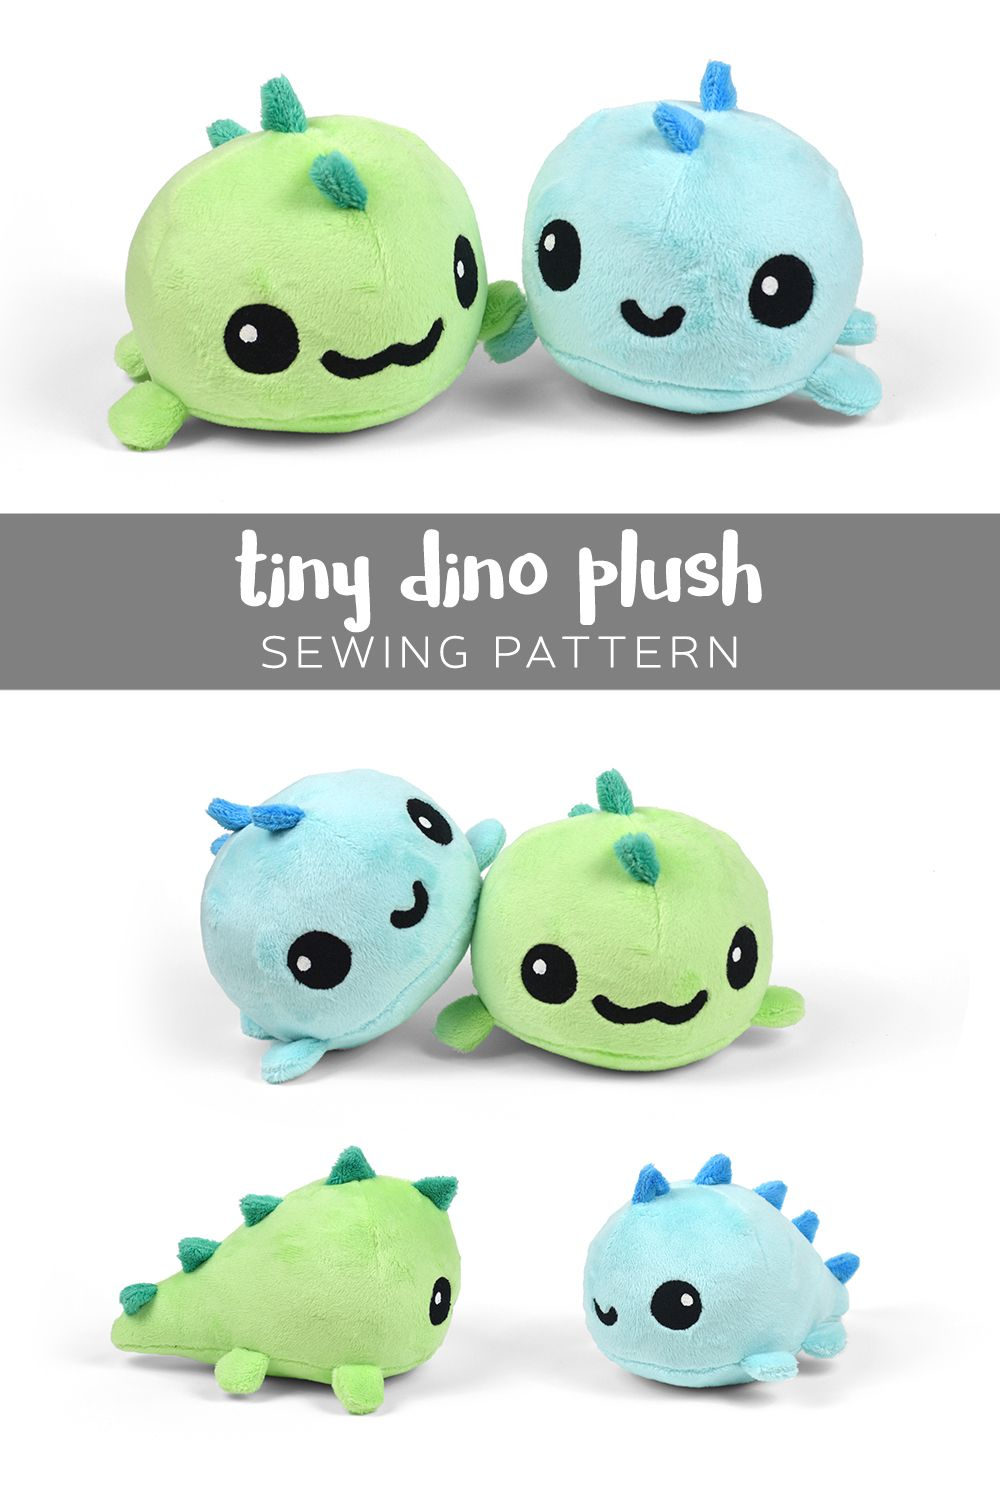 Dino plush softie pattern free pdf download cuteness overload dino plush softie pattern free pdf download cuteness overload jeuxipadfo Choice Image